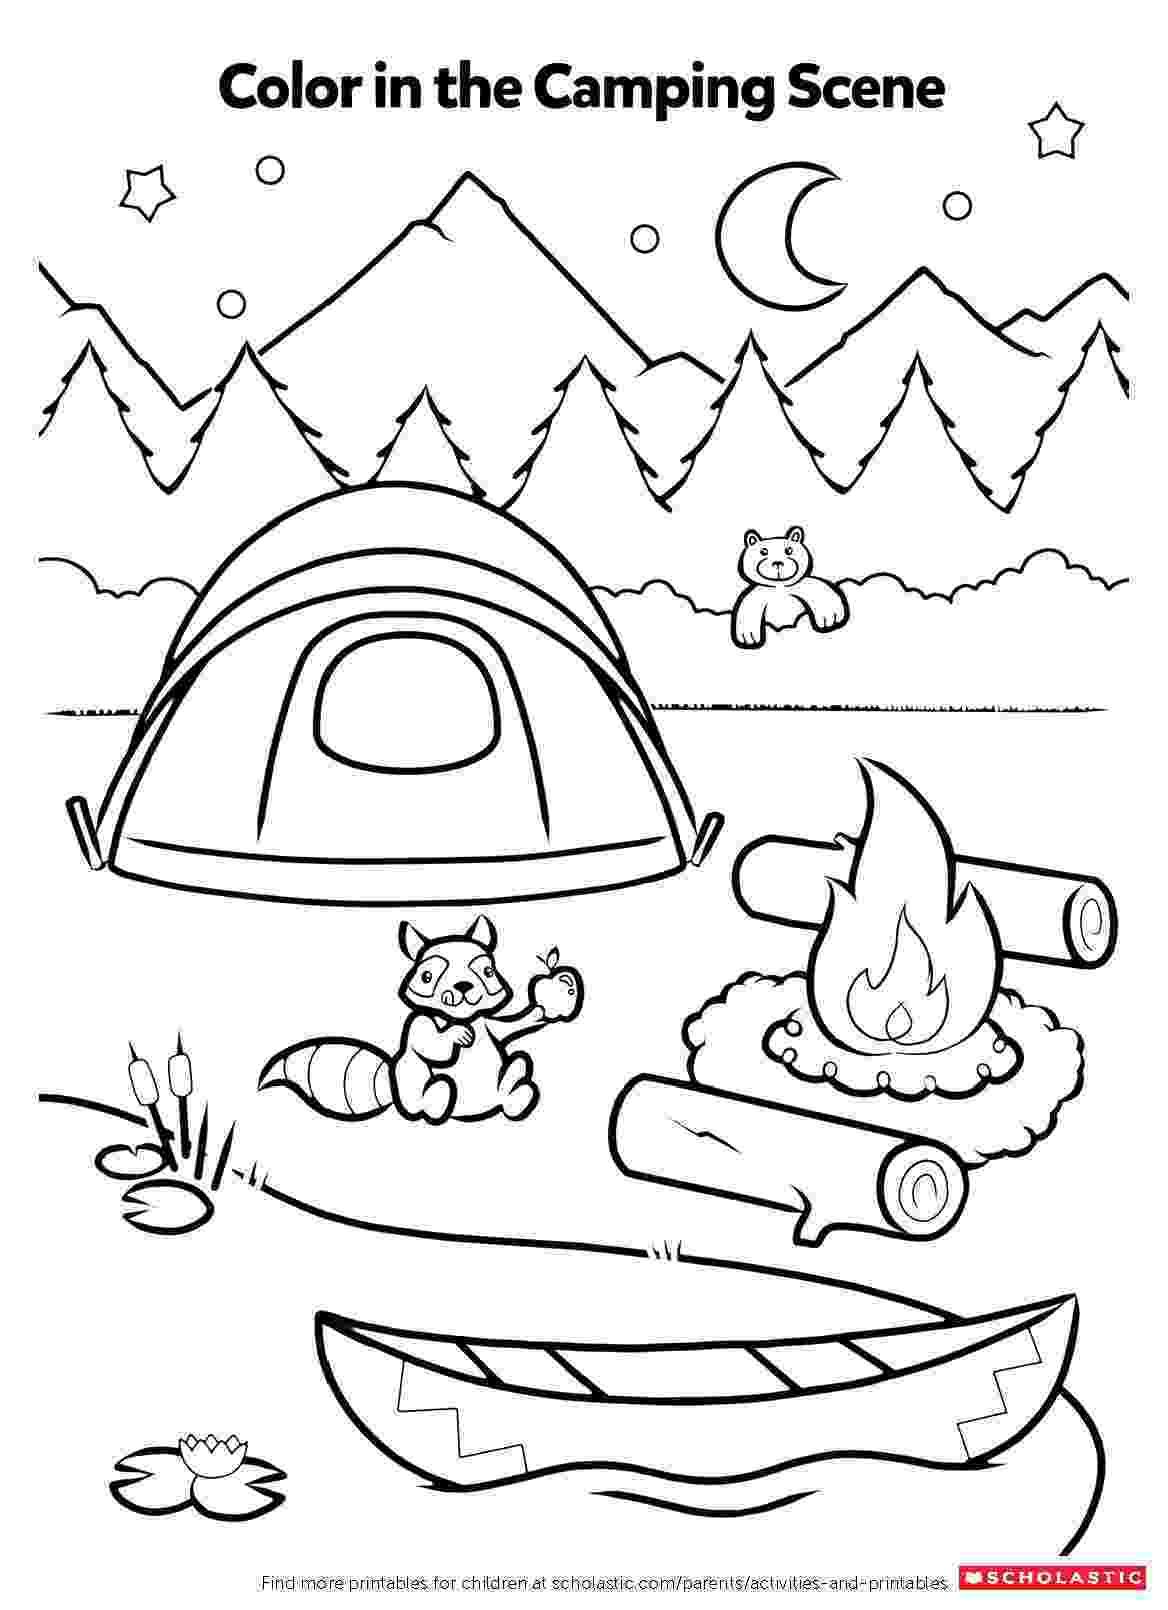 printable preschool coloring pages octopus coloring pages preschool and kindergarten preschool pages printable coloring